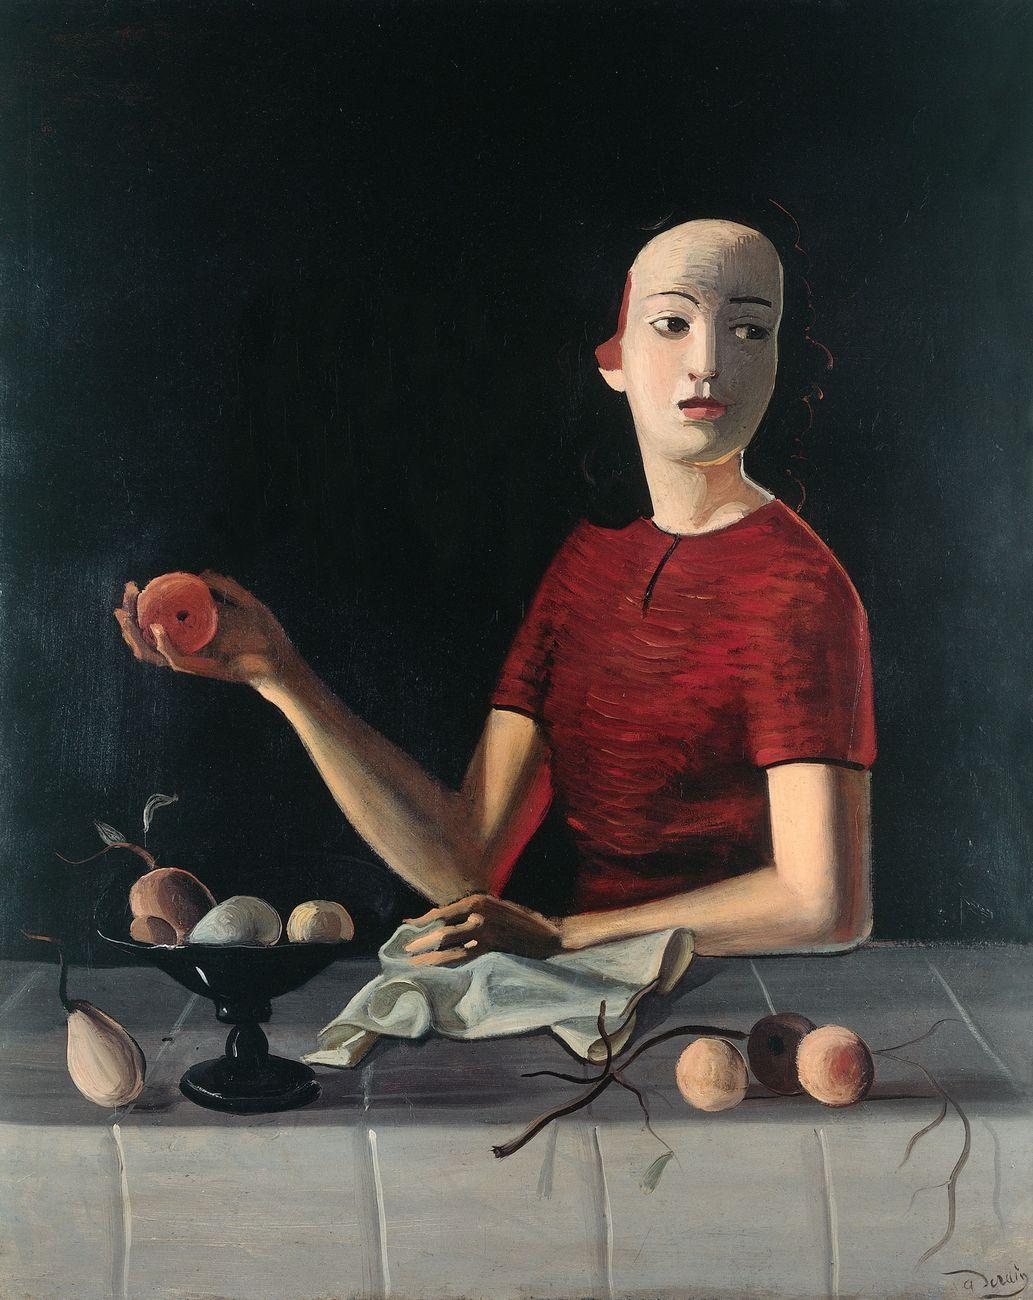 André Derain, Geneviève à la pomme, 1936 37 o 1937 38, olio su tela, 92x73 cm. Collezione Geneviève Taillade © 2020, ProLitteris, Zurich